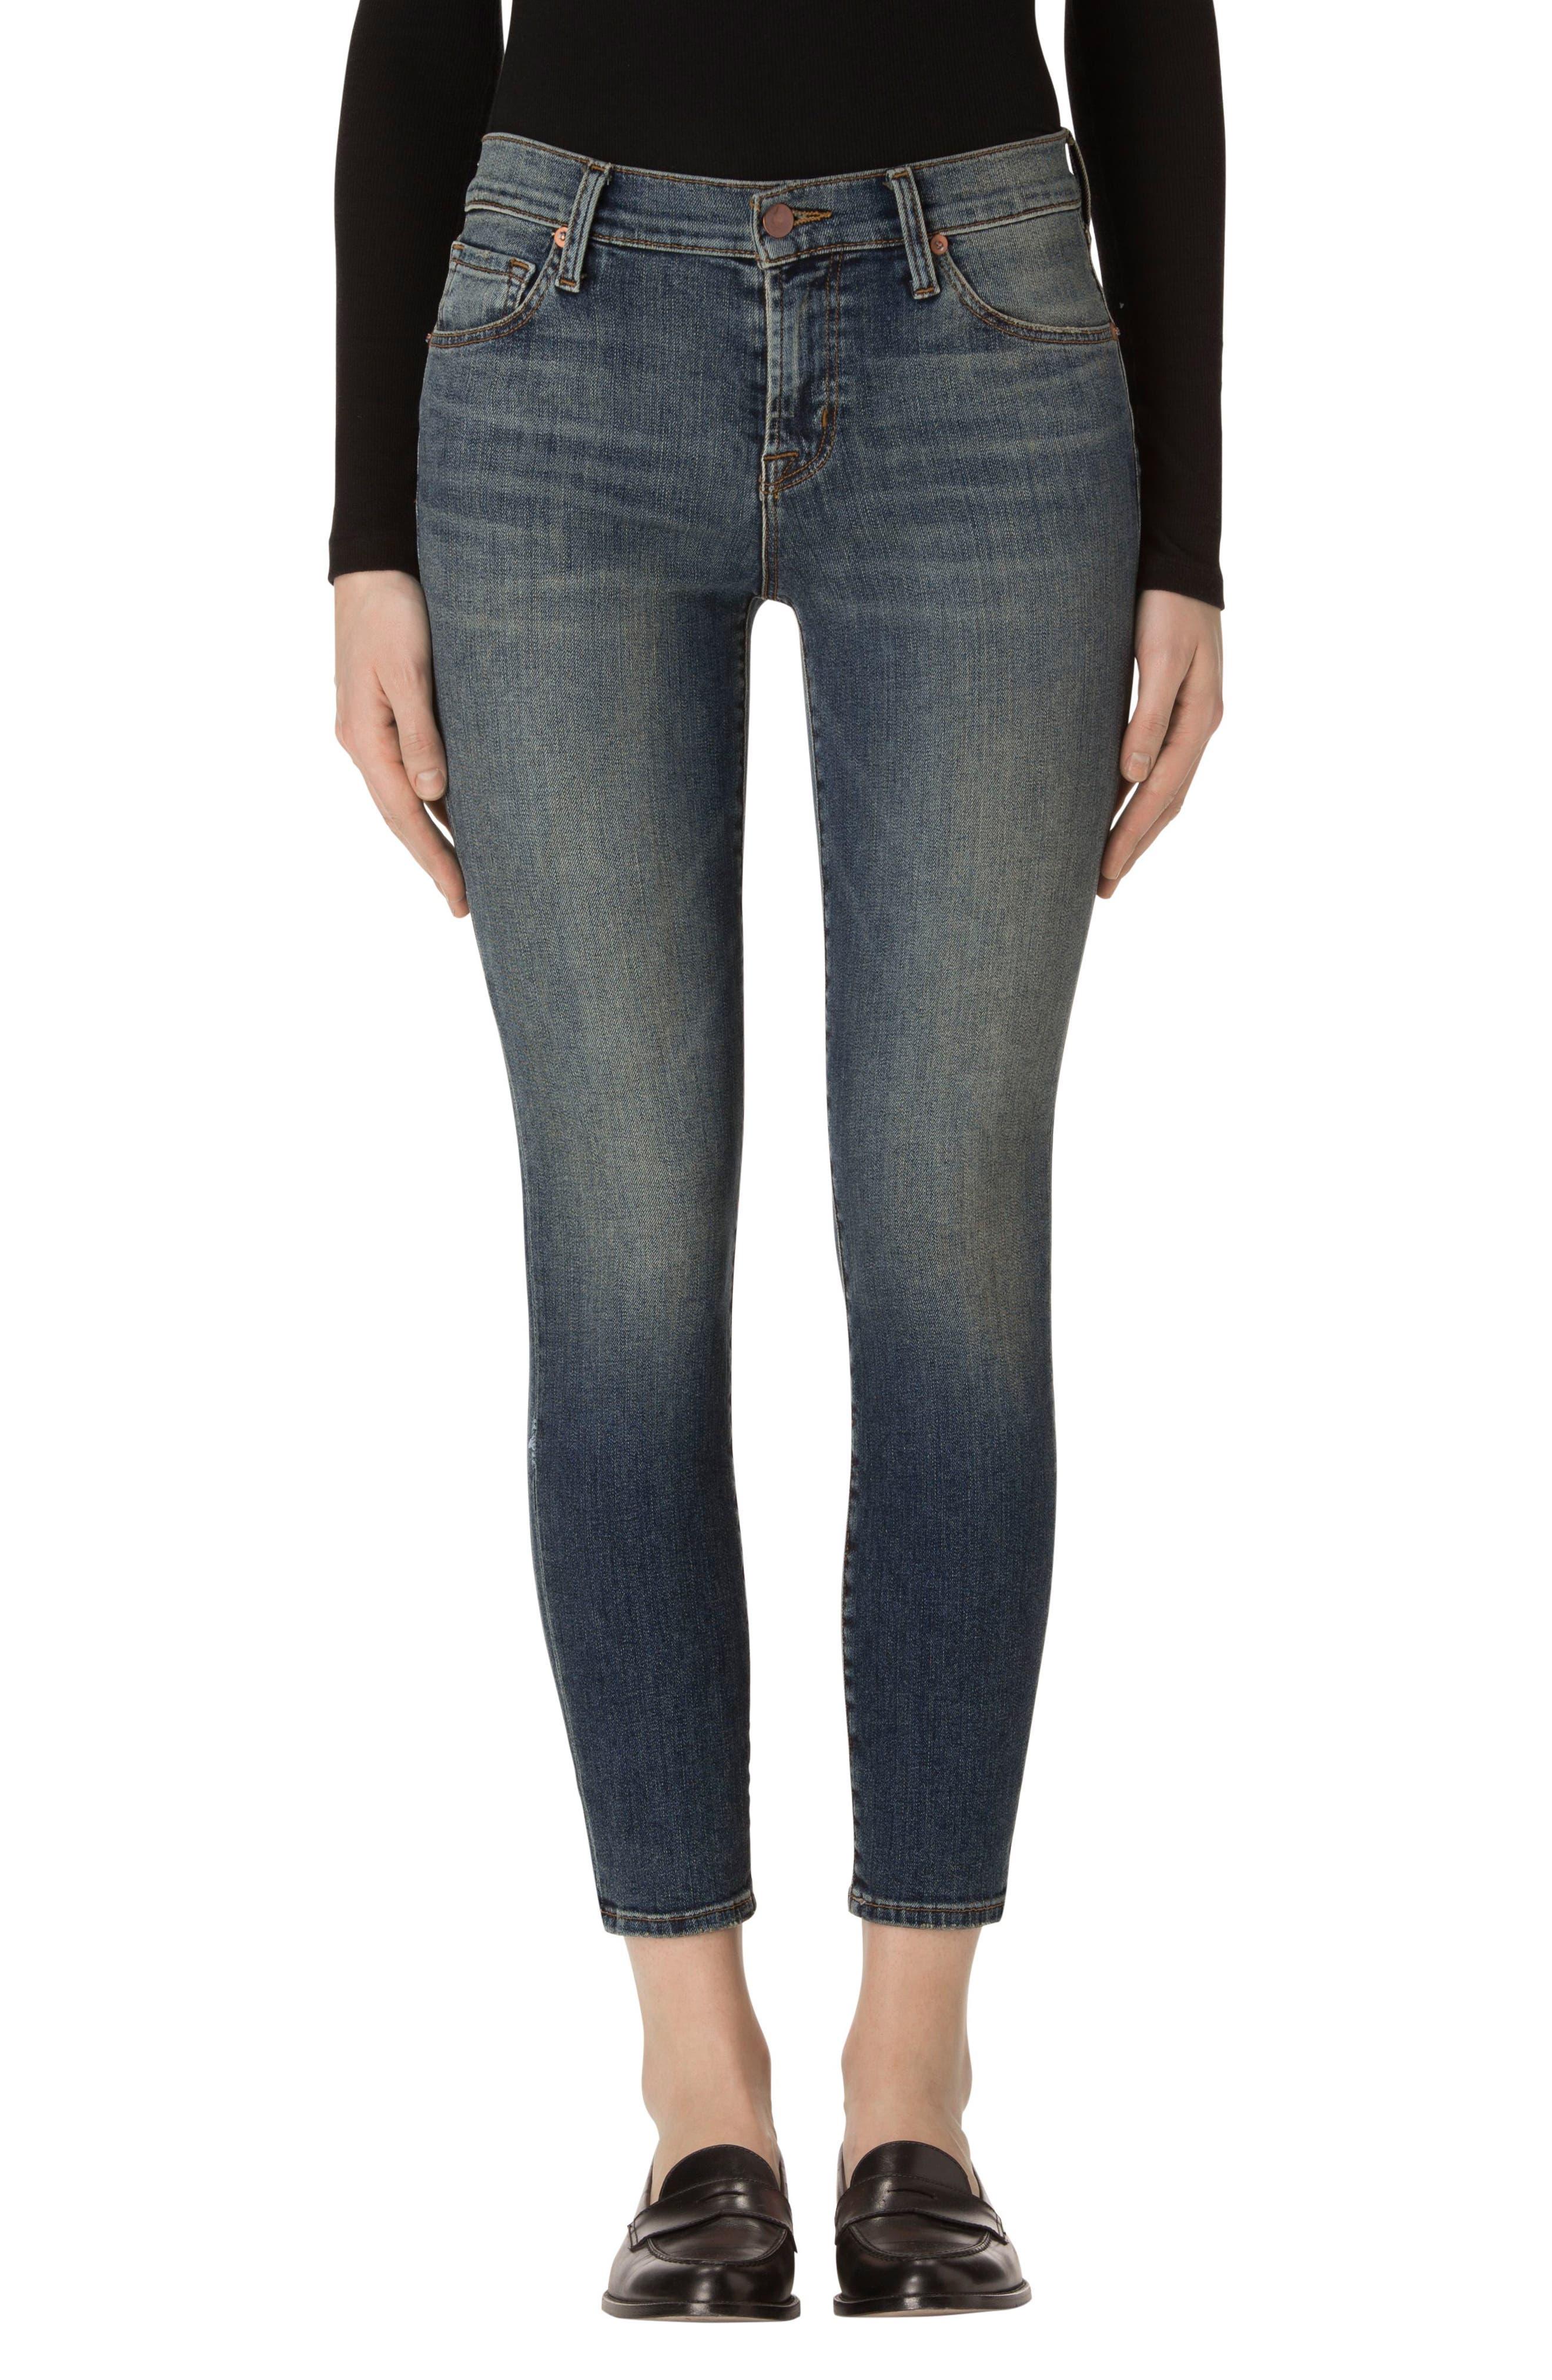 J BRAND 835 Skinny Jeans